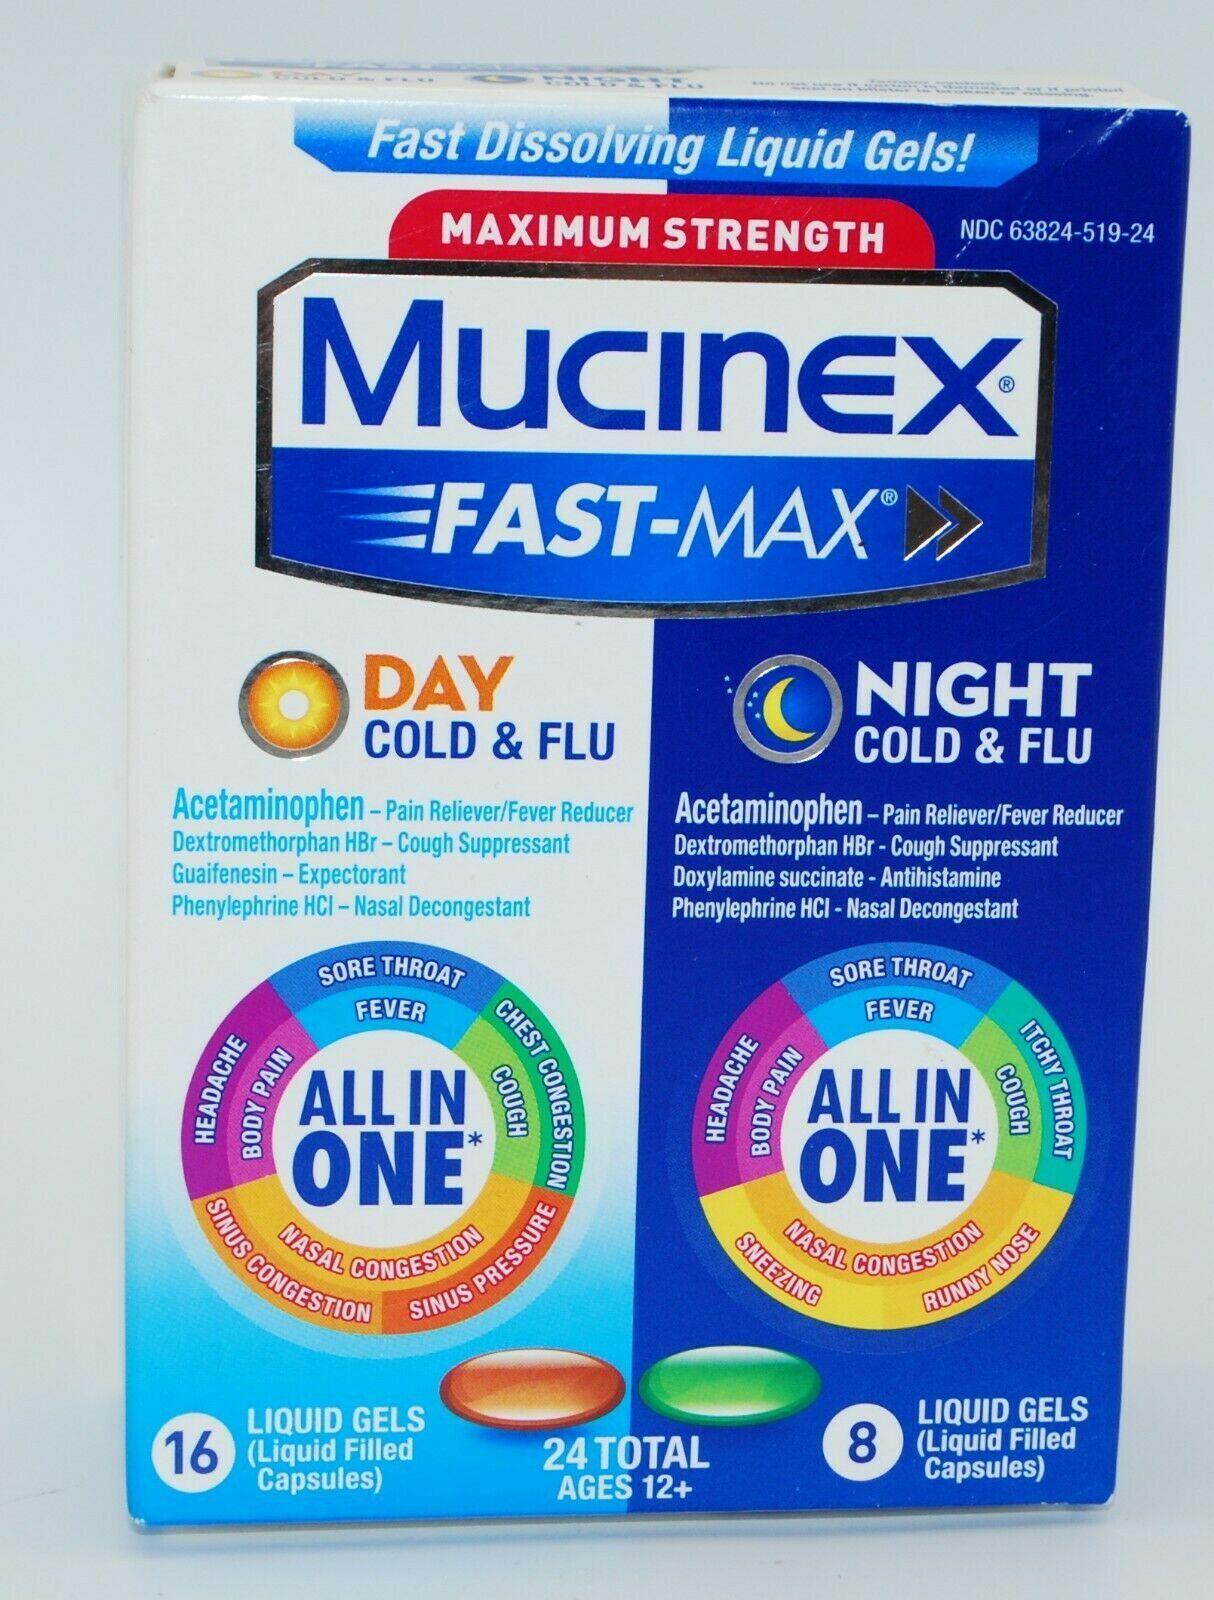 Mucinex Fast-Max Day/Night Cold & Flu Medicine, 24 Liquid Ge